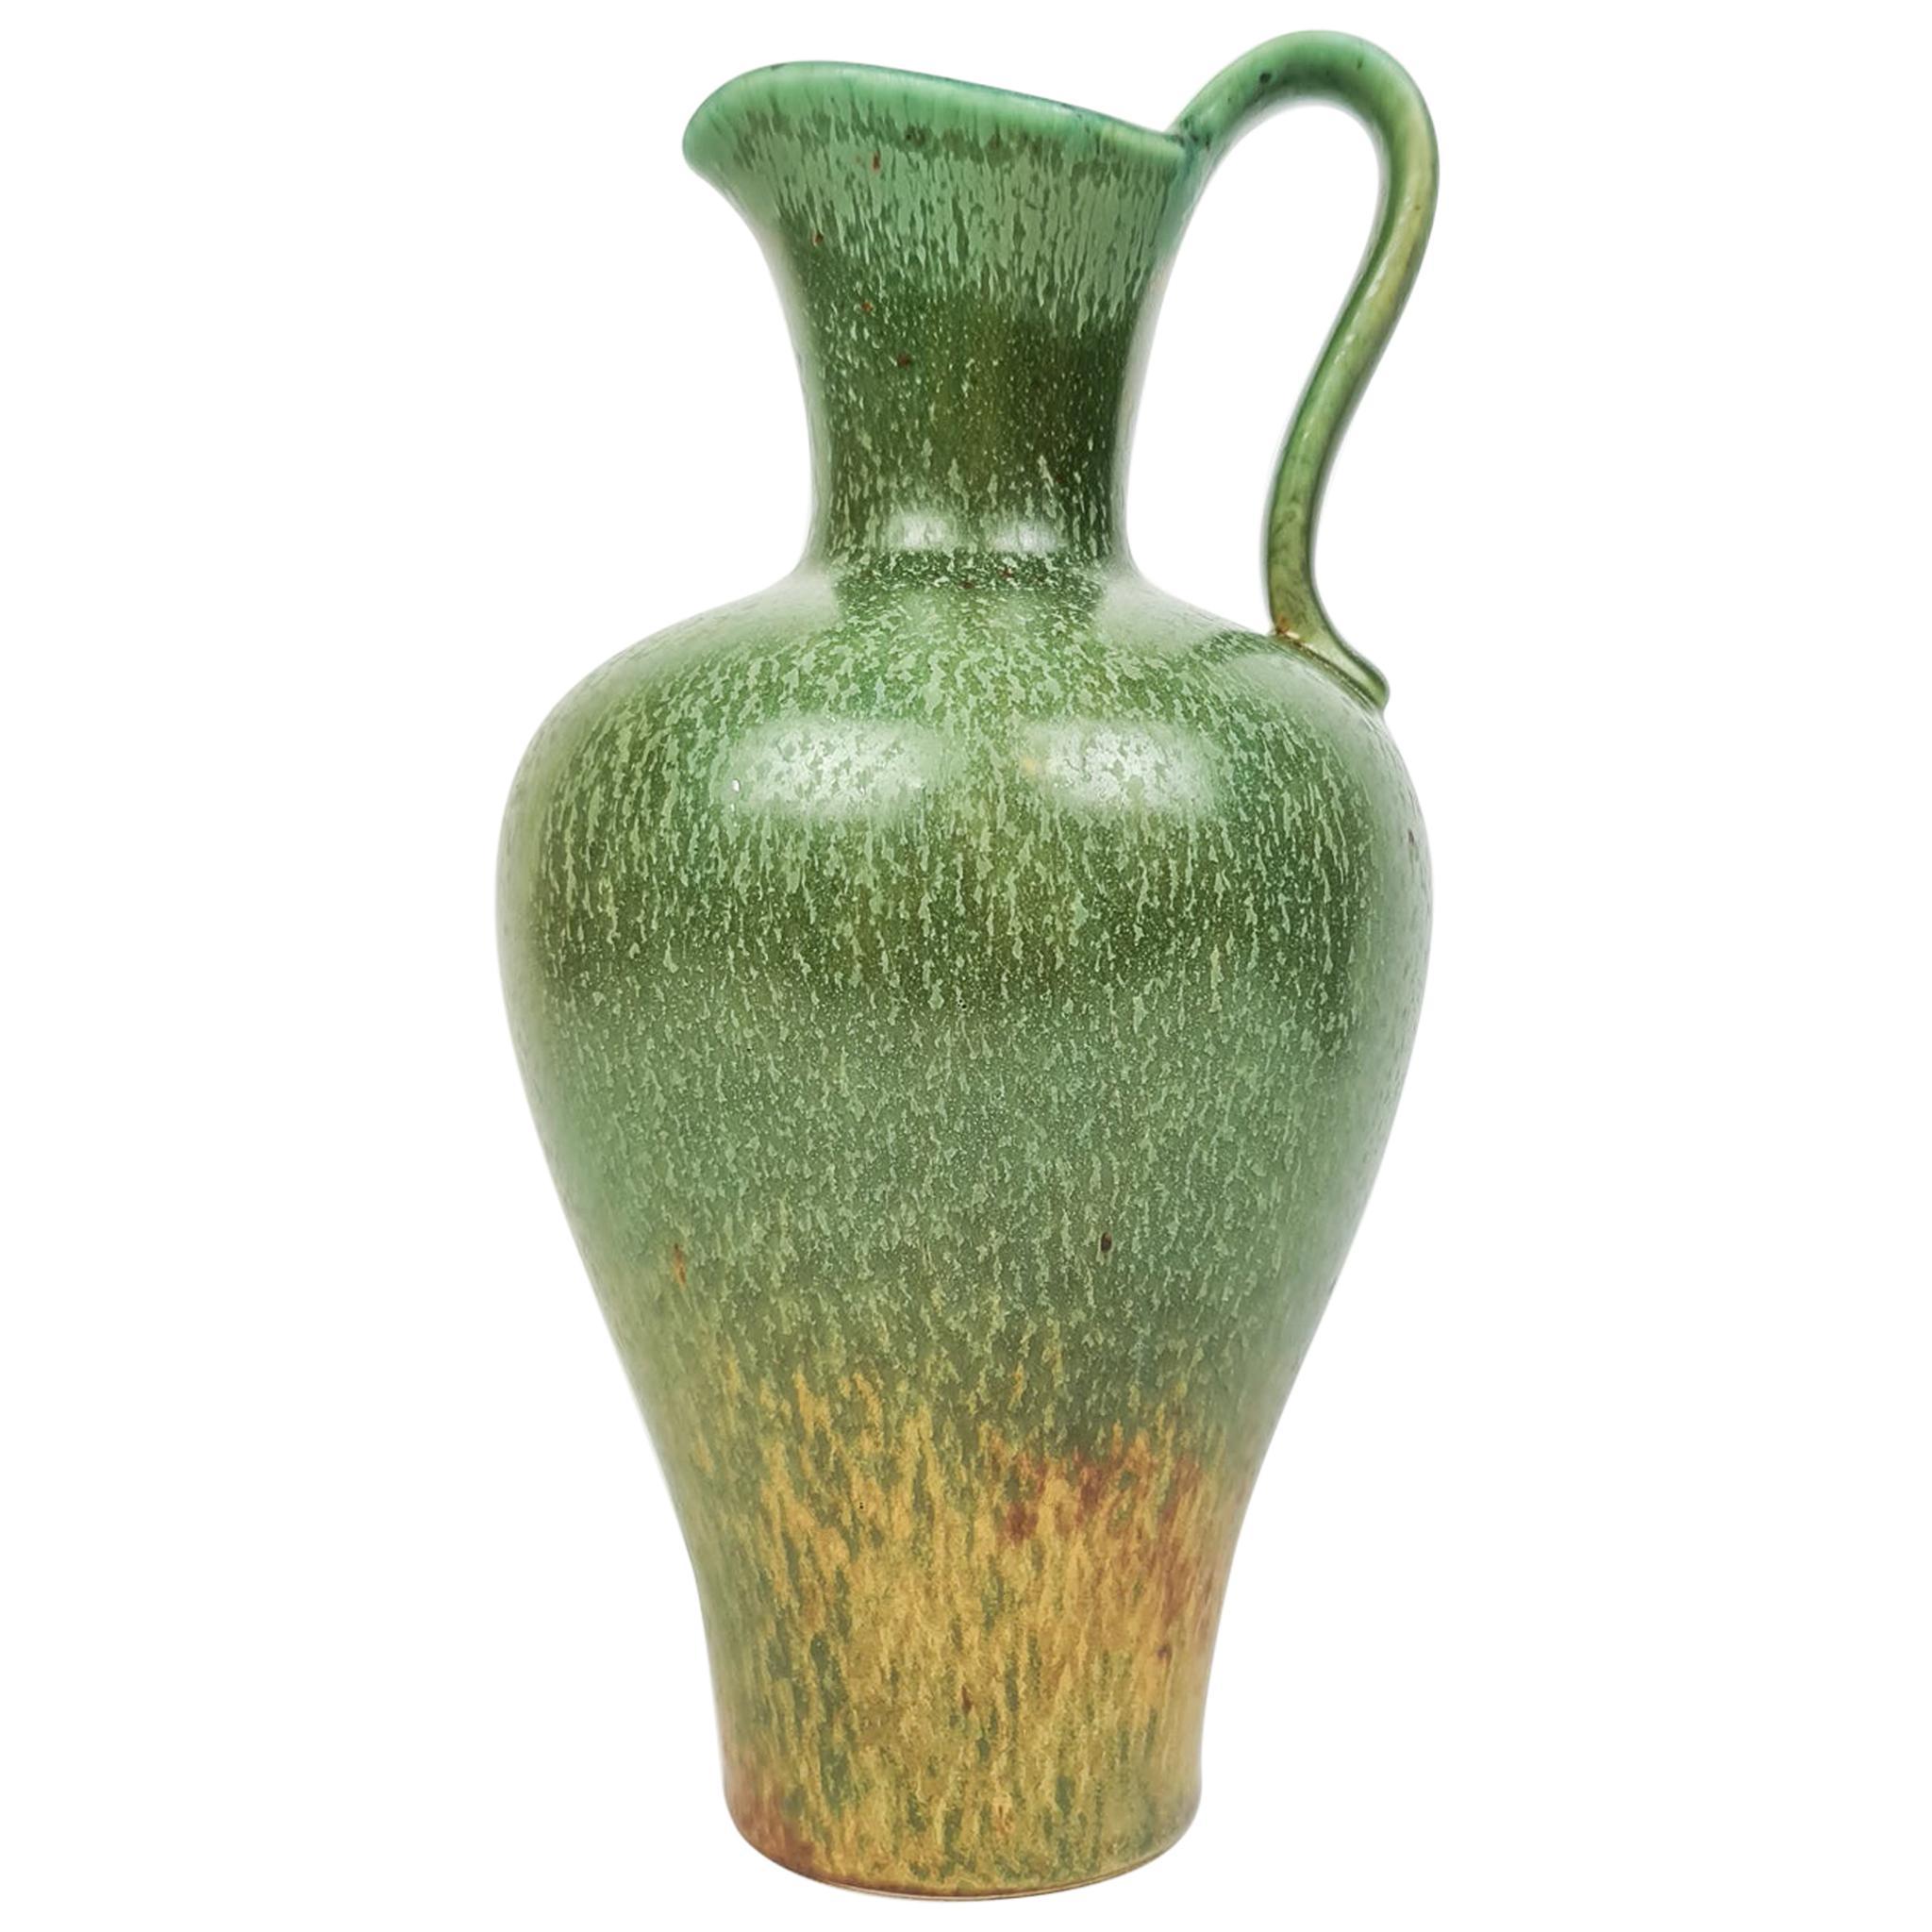 Midcentury Ceramic Vase Rörstrand Gunnar Nylund, Sweden